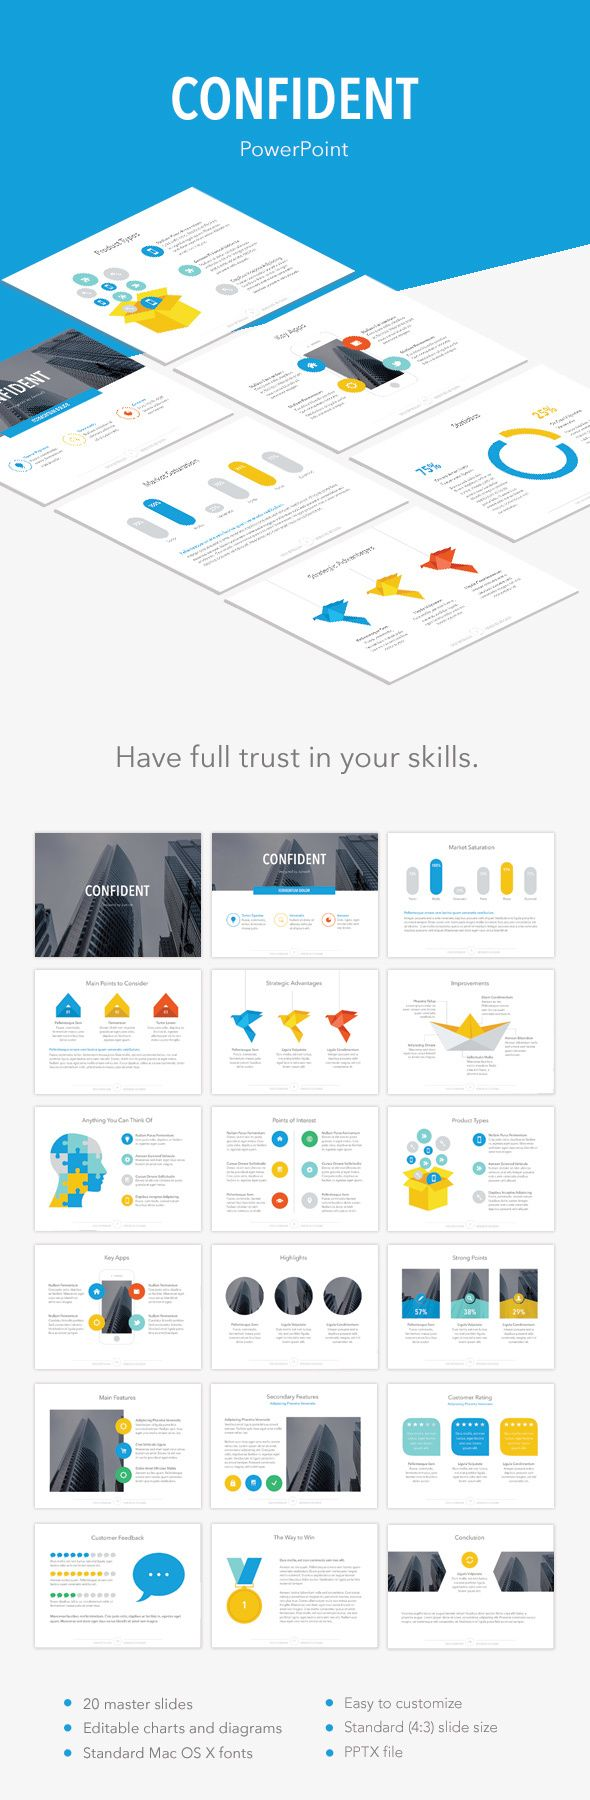 Confident PowerPoint Template. Download here: http://graphicriver.net/item/confident-powerpoint-template/14726315?ref=ksioks